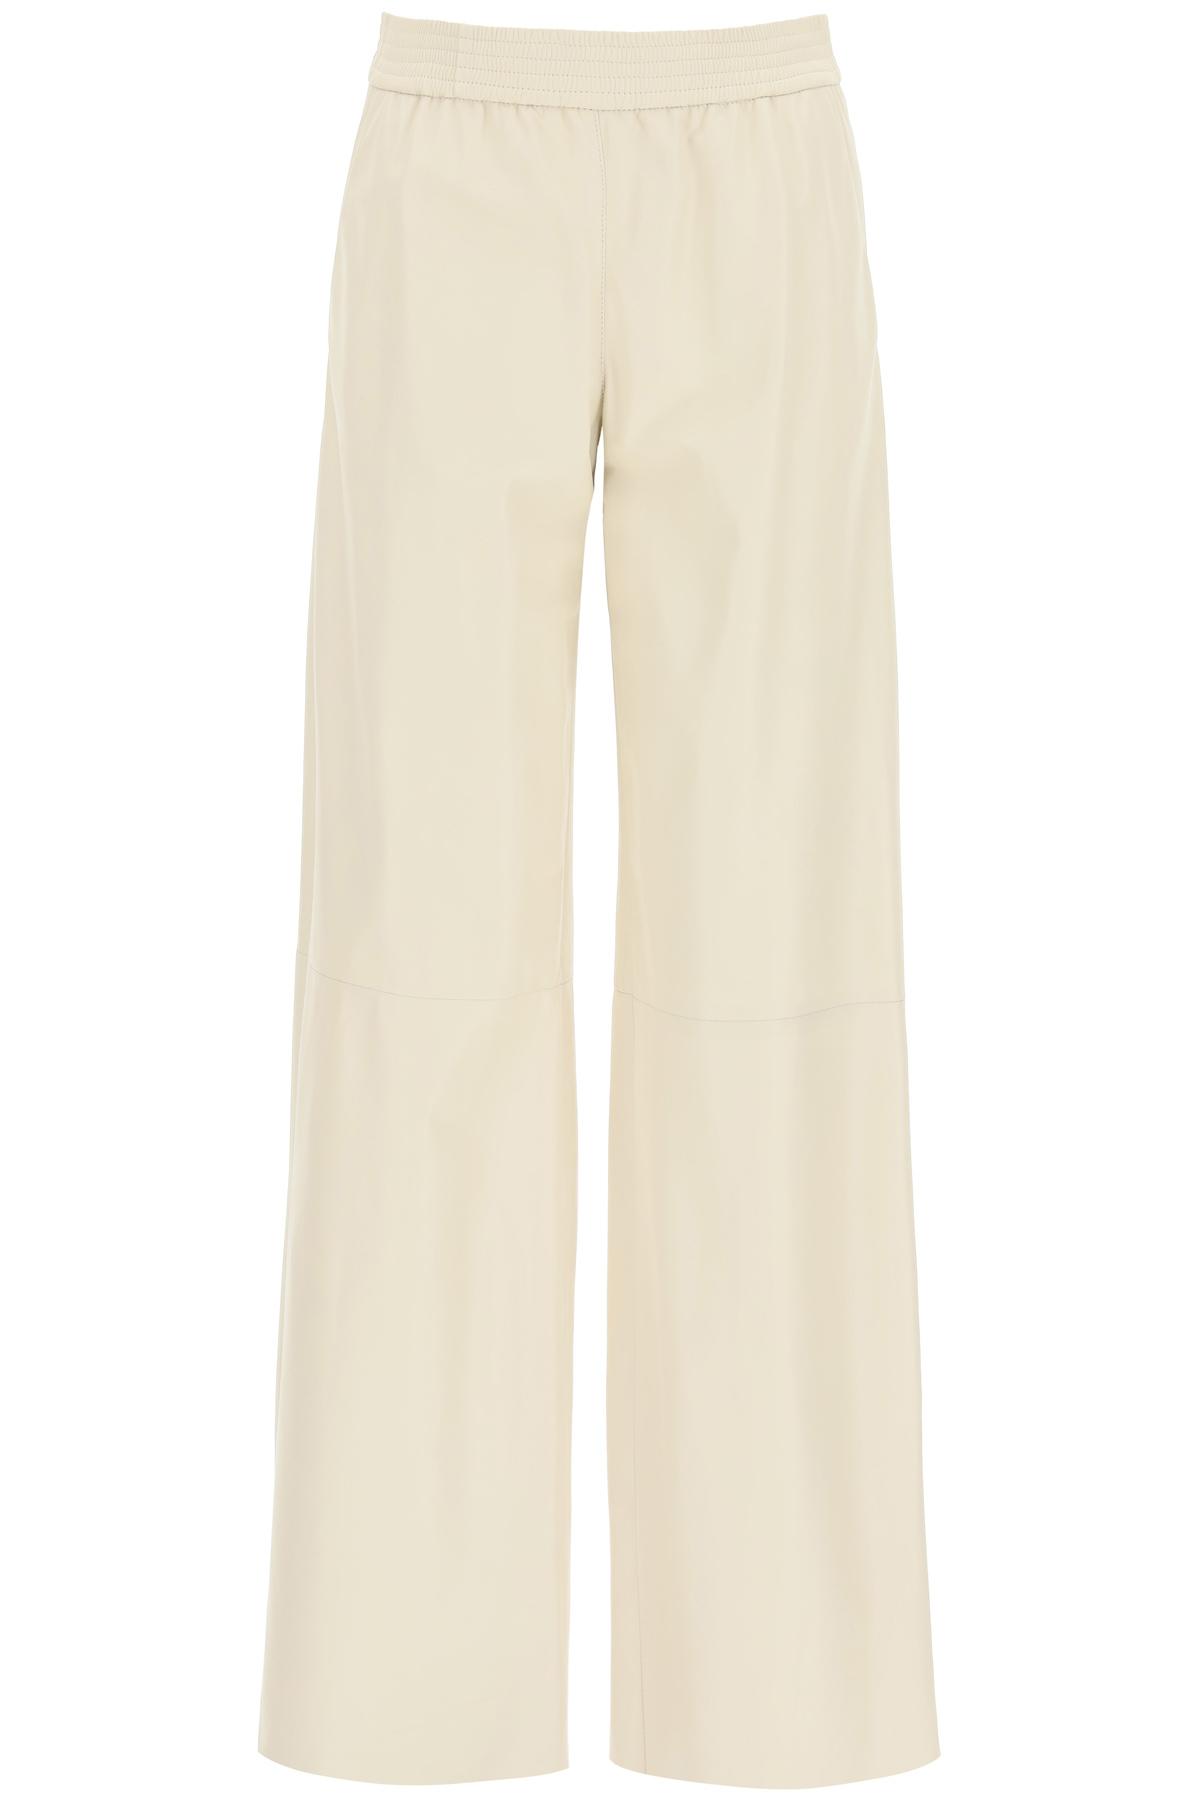 Drome pantaloni palazzo in nappa